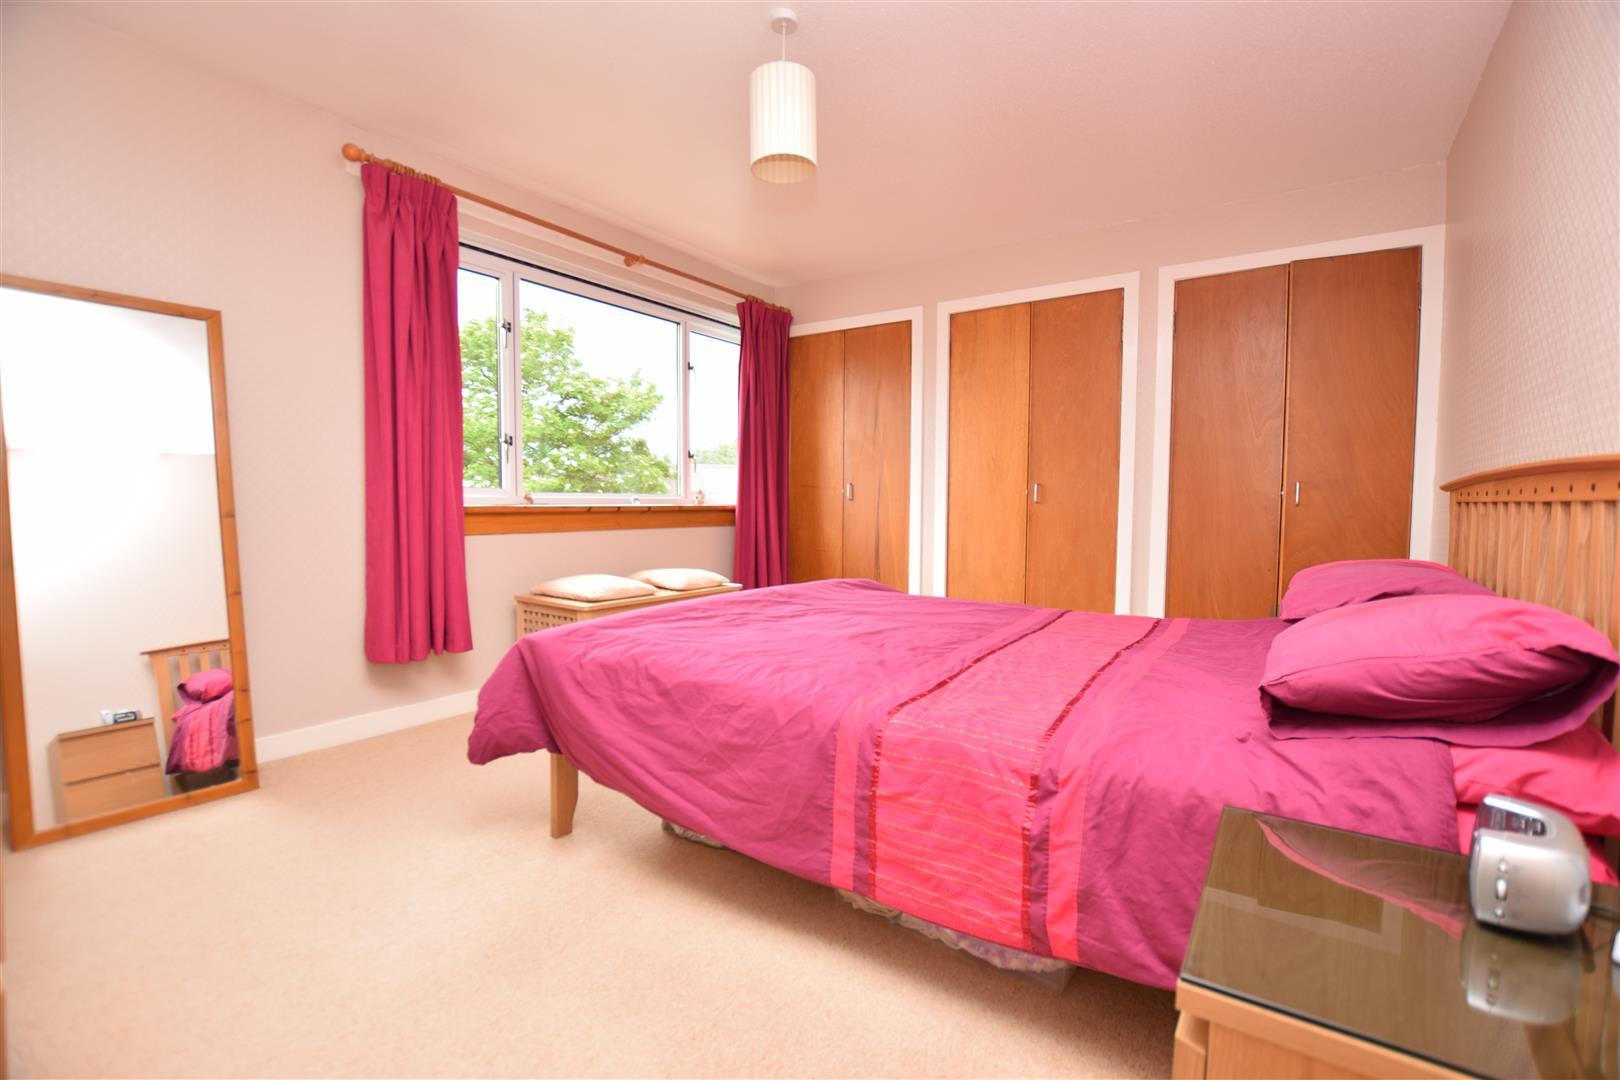 34, Sidlaw Crescent, COUPAR ANGUS, Perthshire, PH13 9BX, UK